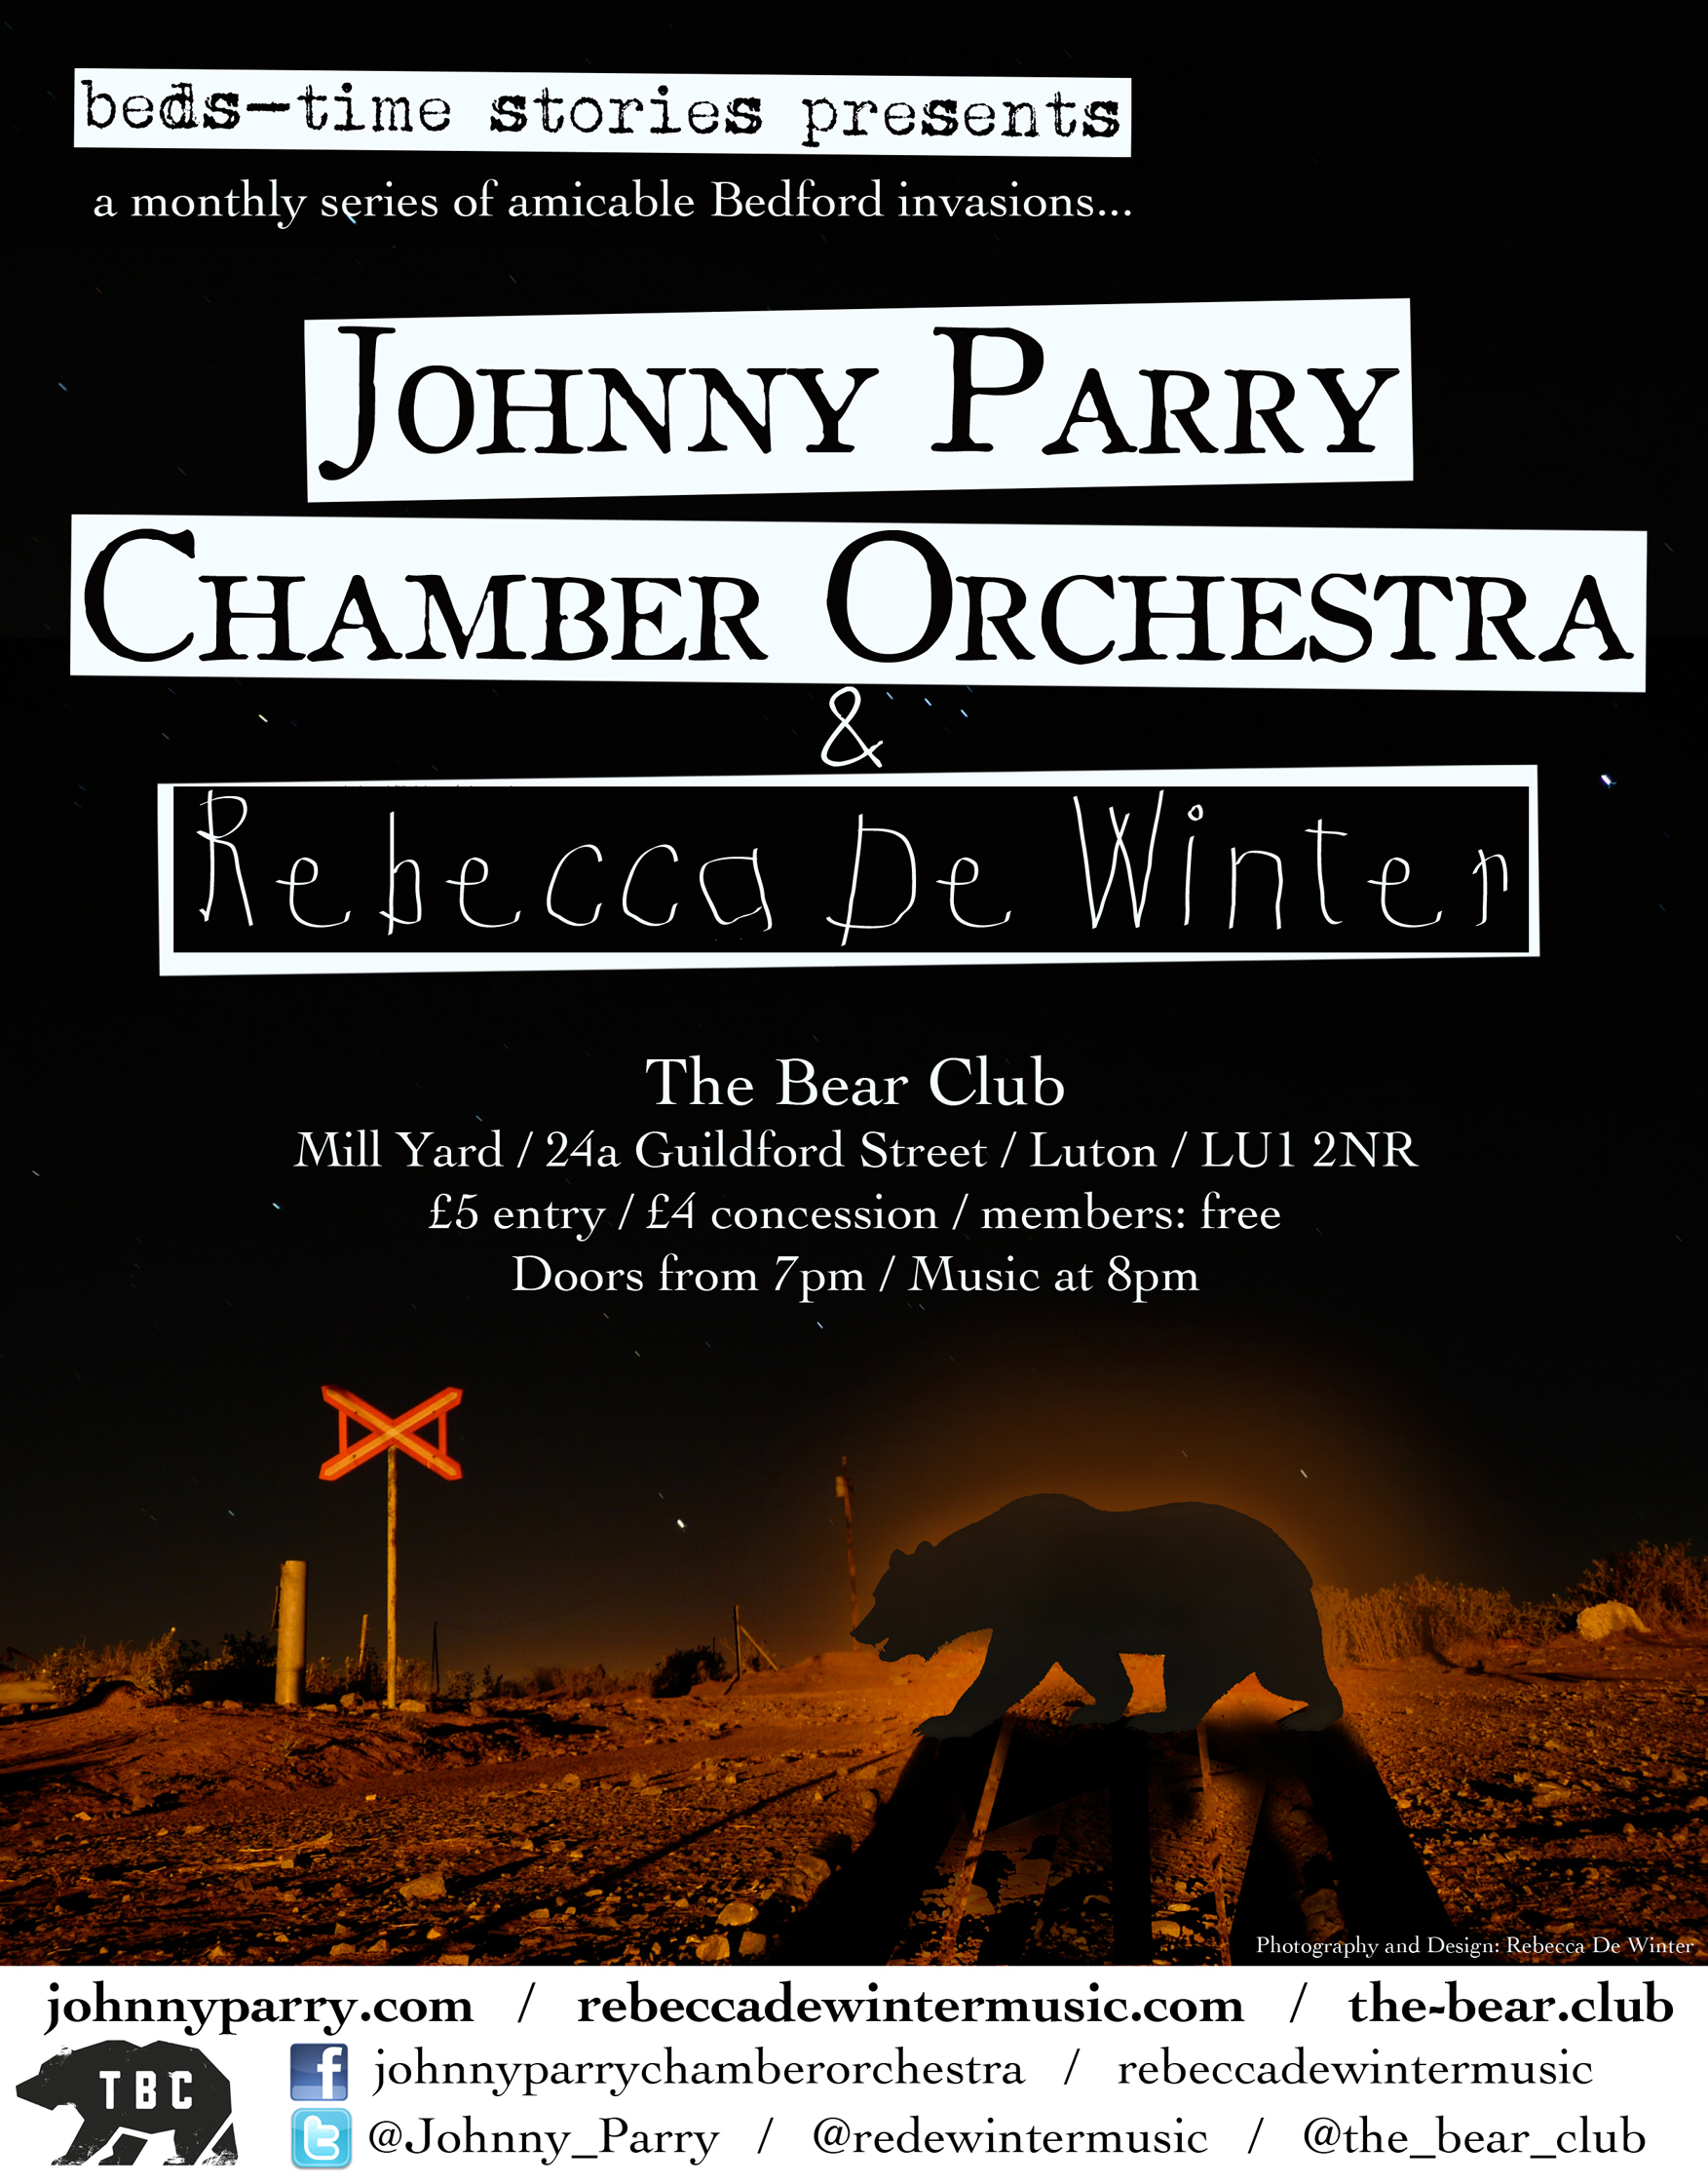 15 03 14 The Bear Club Poster A5.jpg